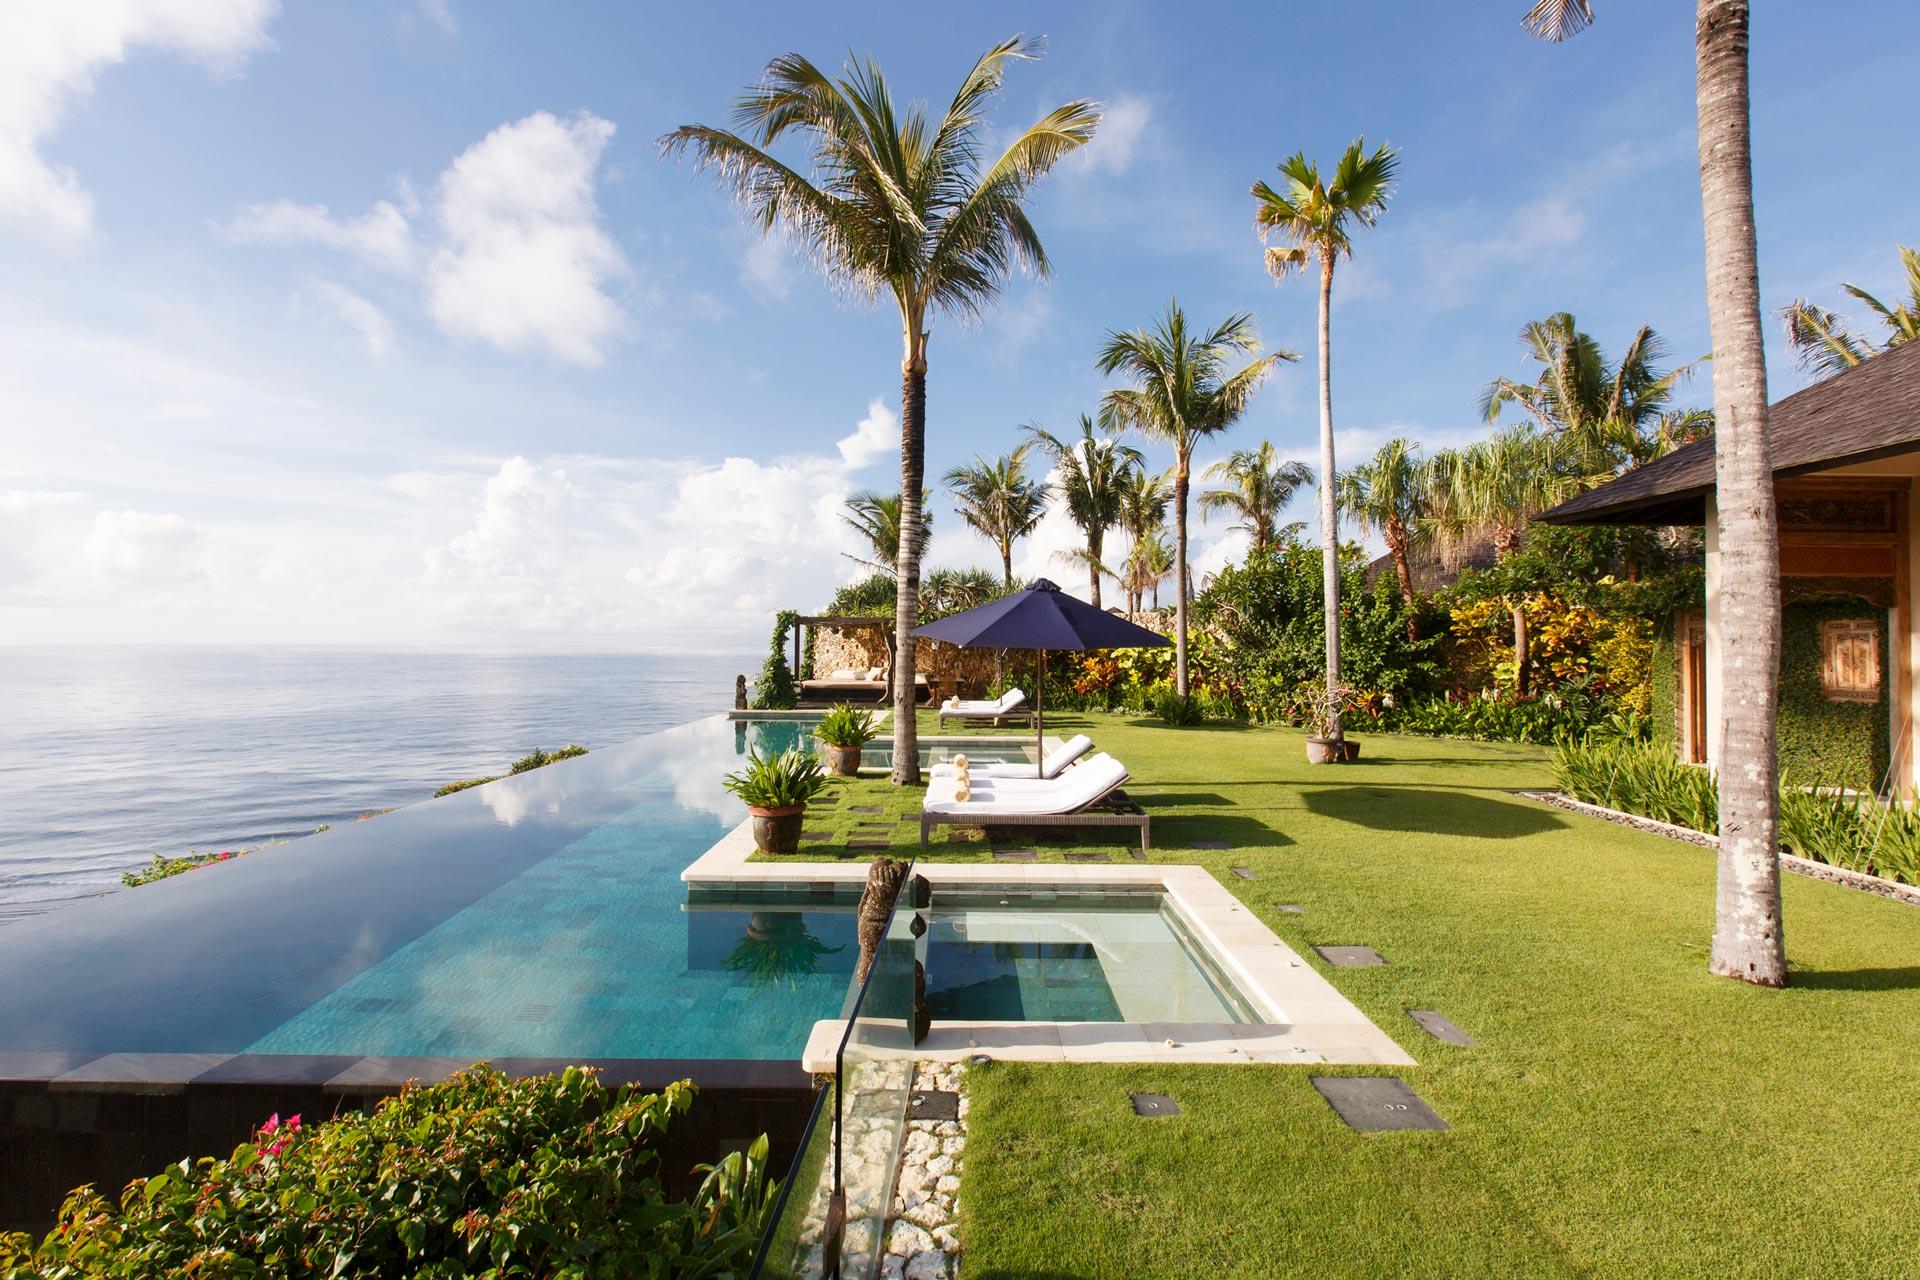 Villa Ambar - Bali Luxury Villas